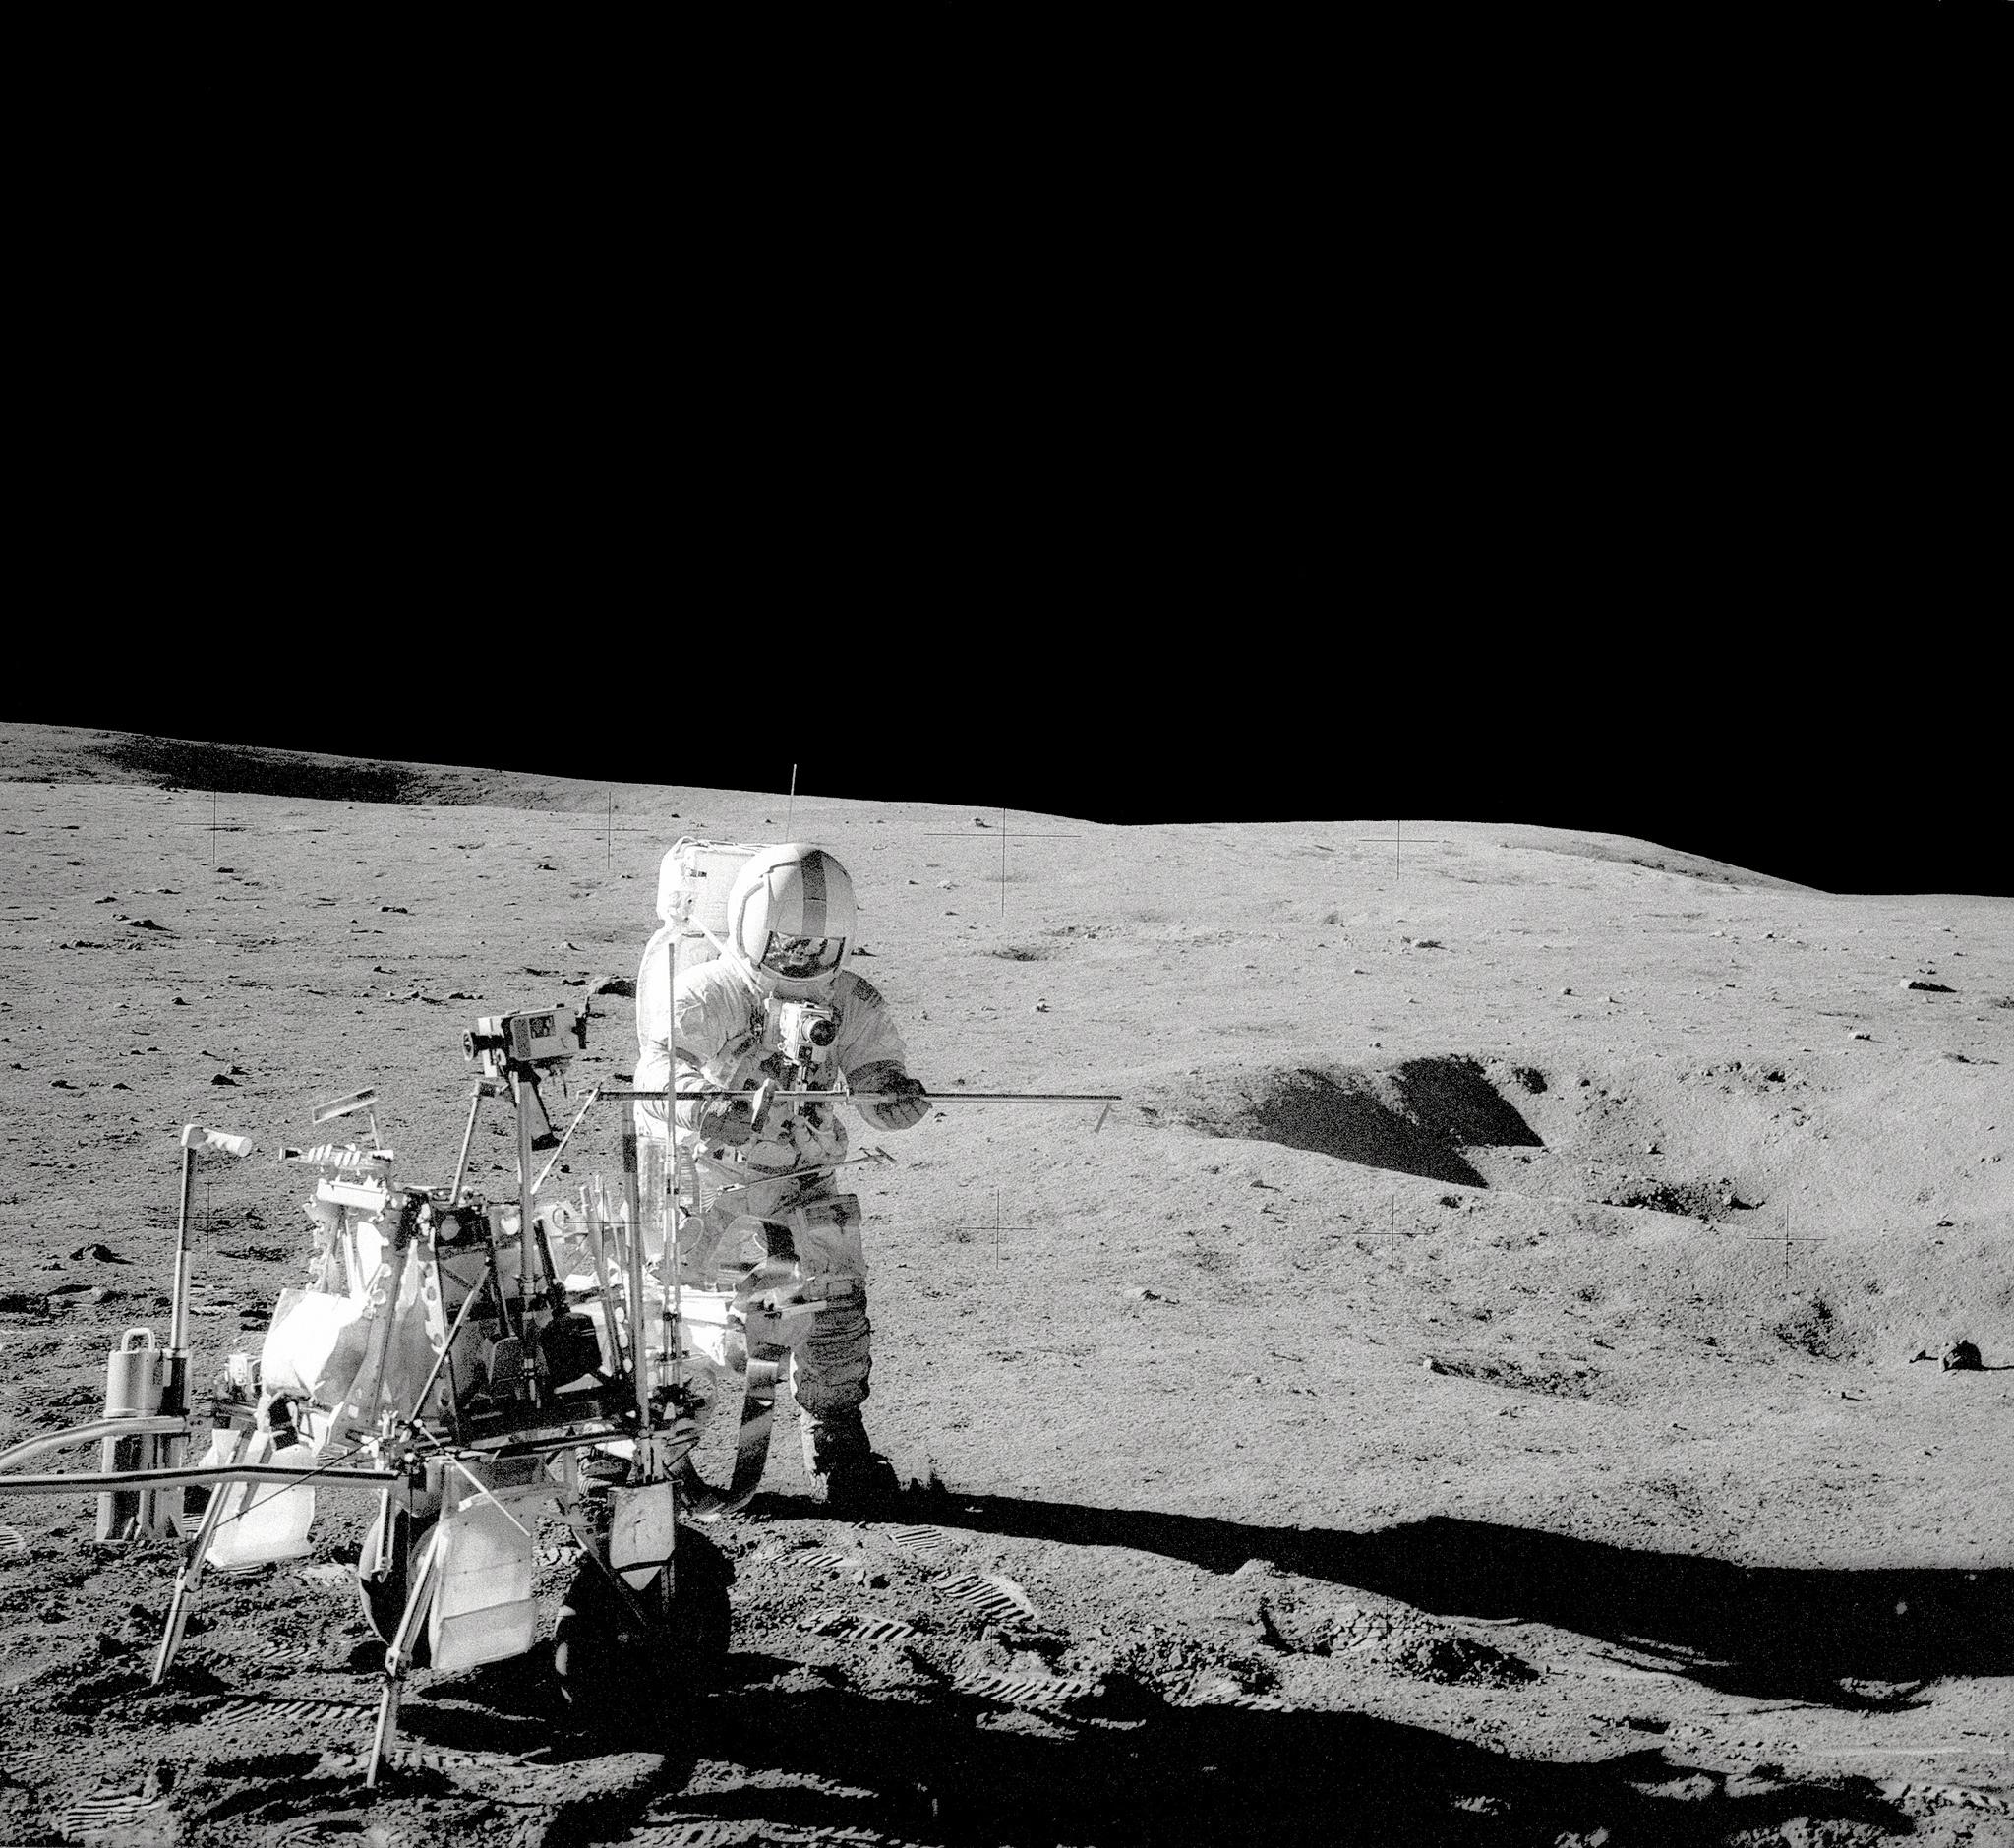 Apollo 14 Commander Alan Shepard playing golf